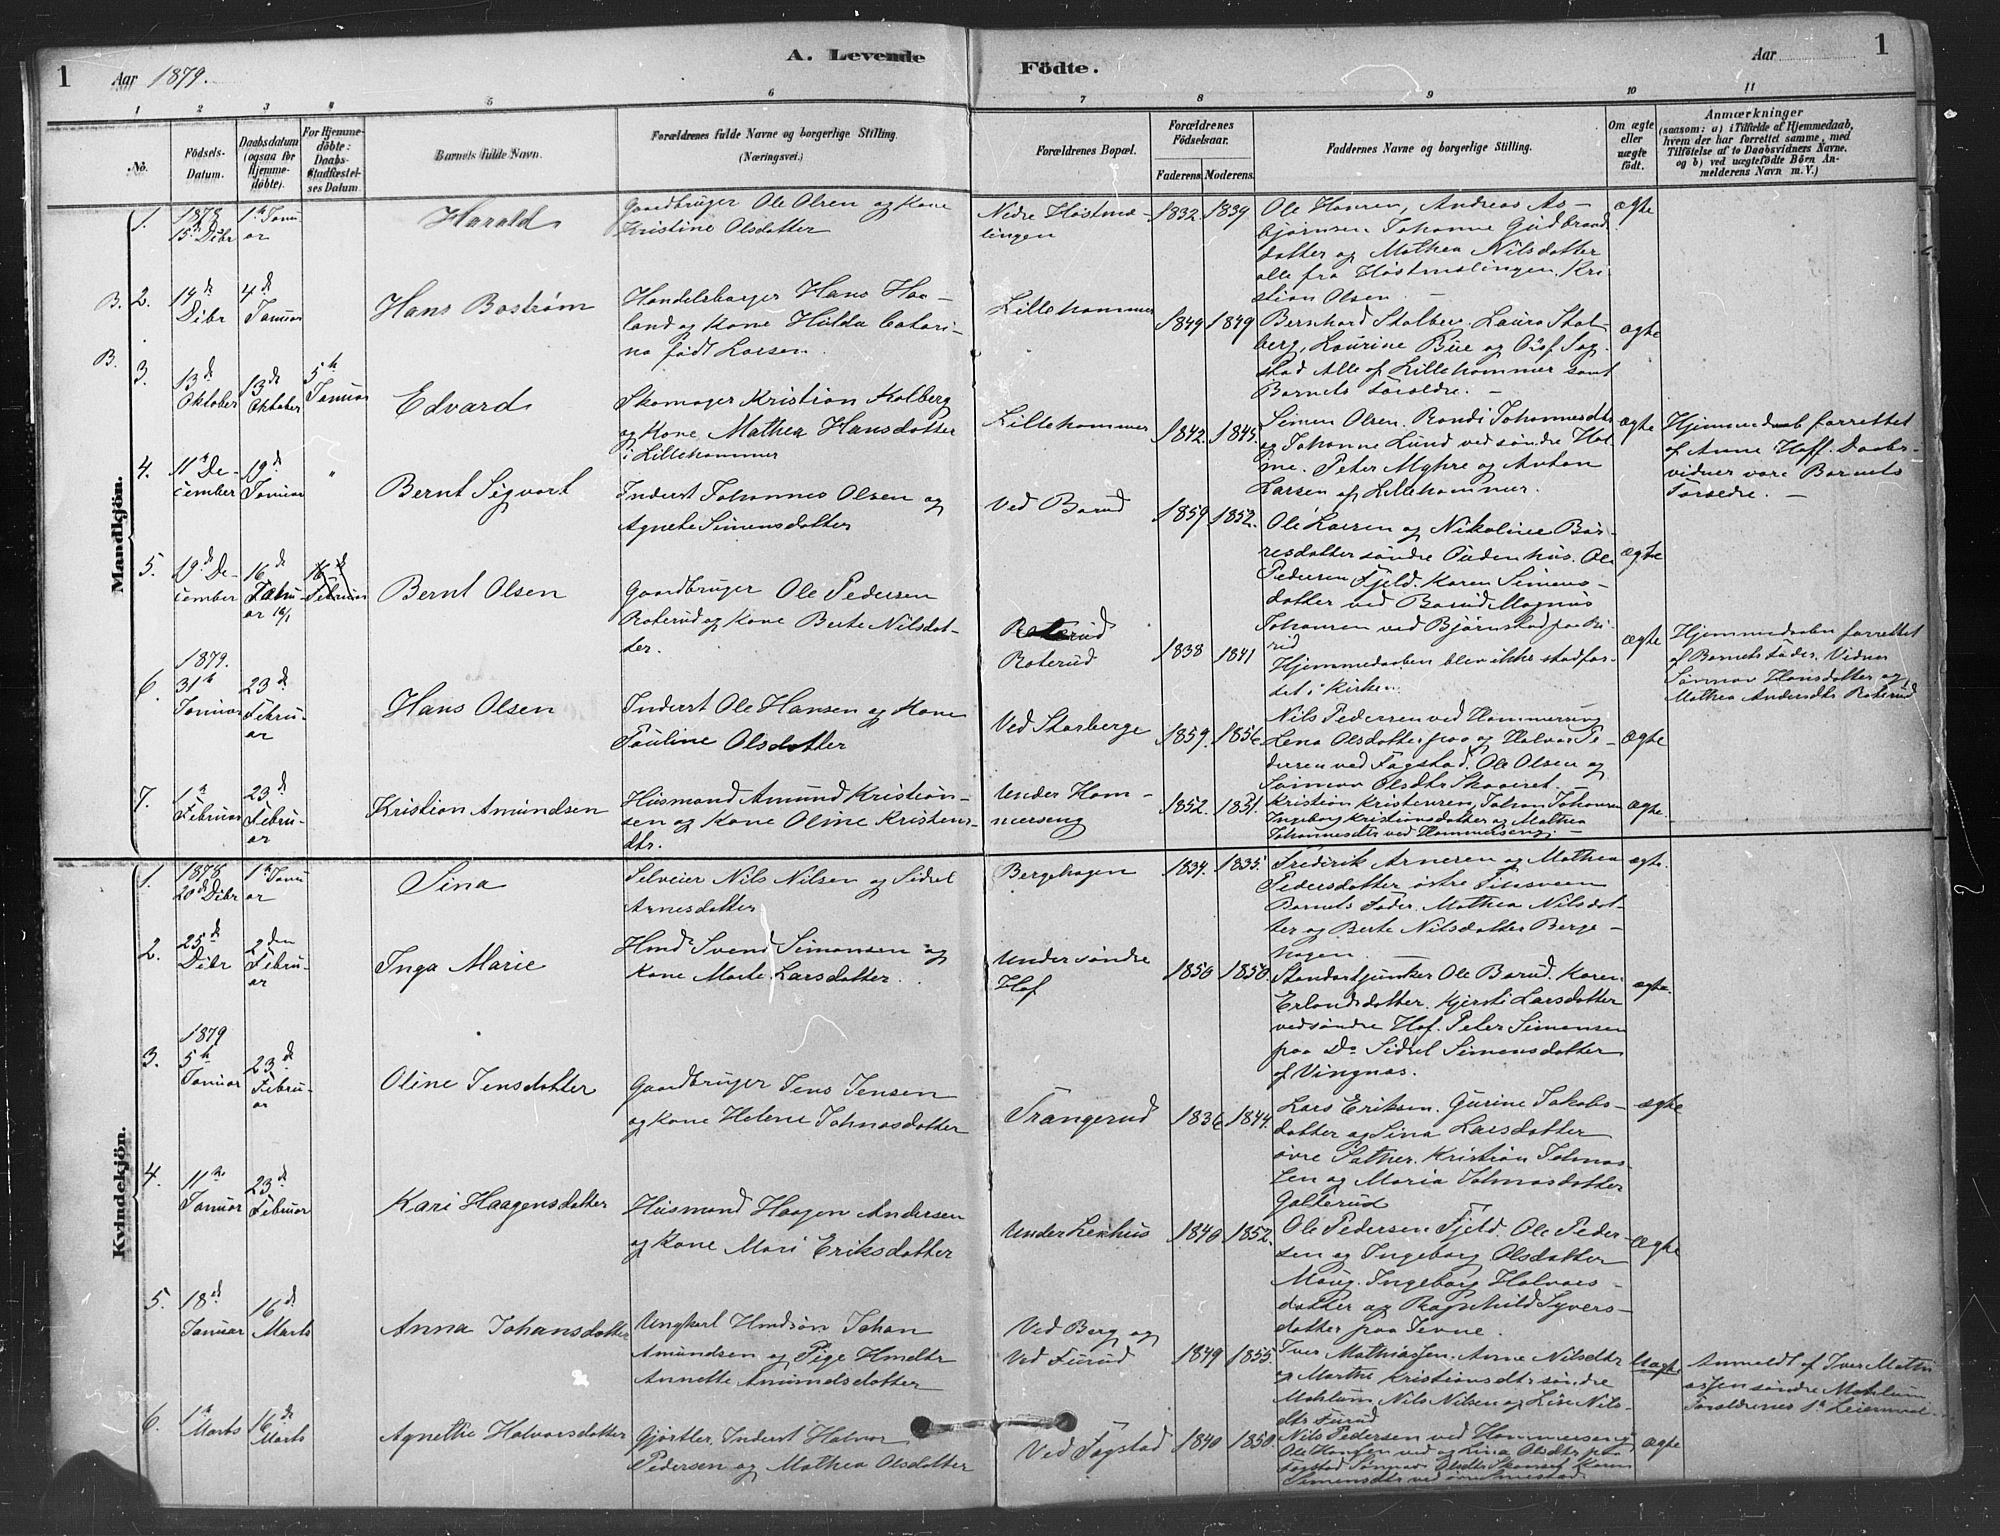 SAH, Fåberg prestekontor, Ministerialbok nr. 9, 1879-1898, s. 1